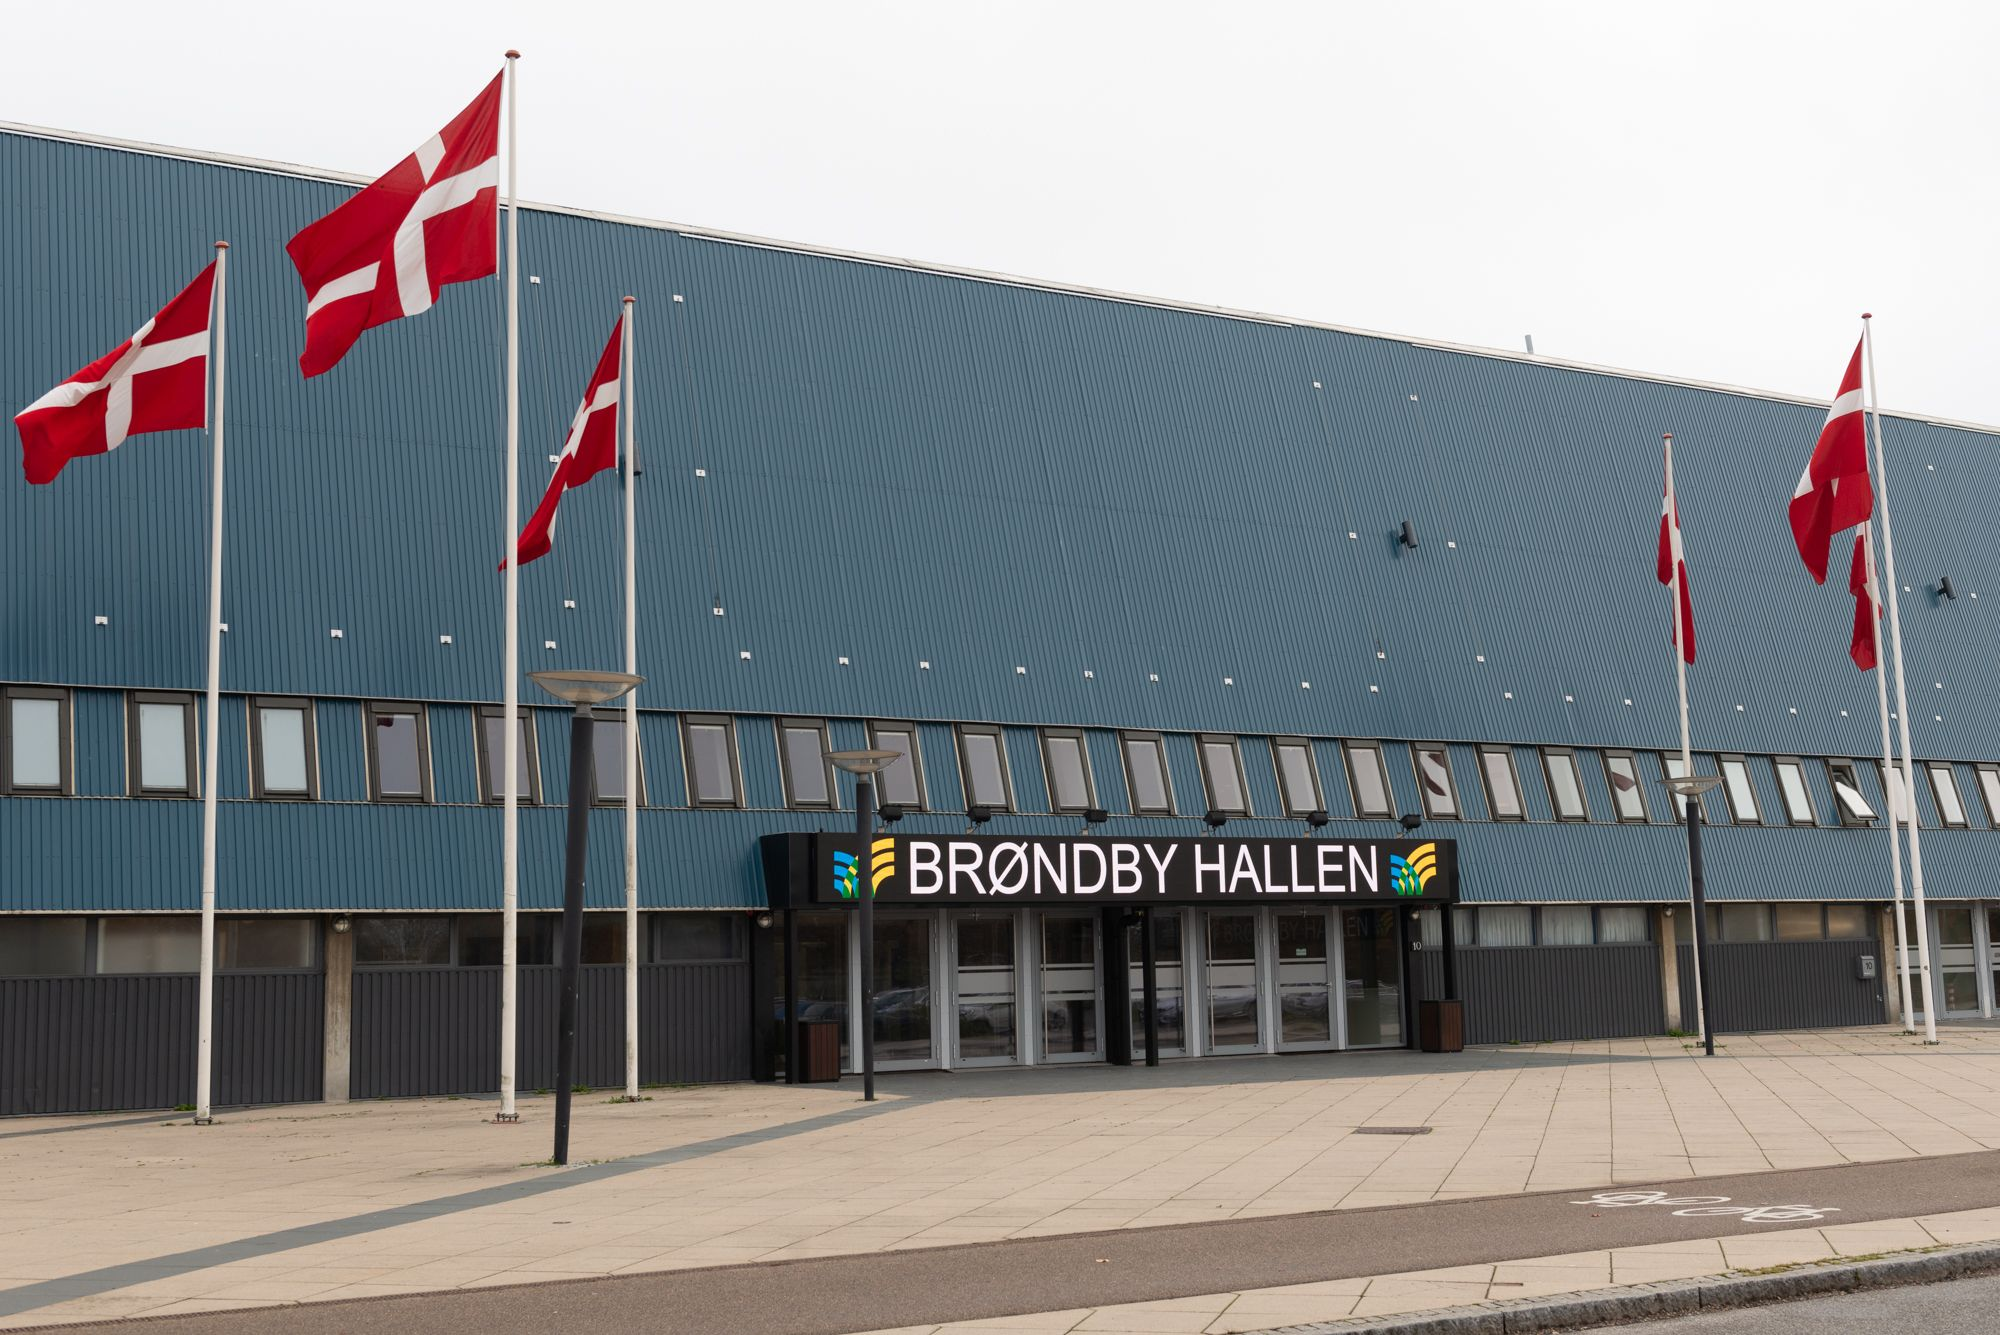 2018.11.13 Brøndby Hallen-153